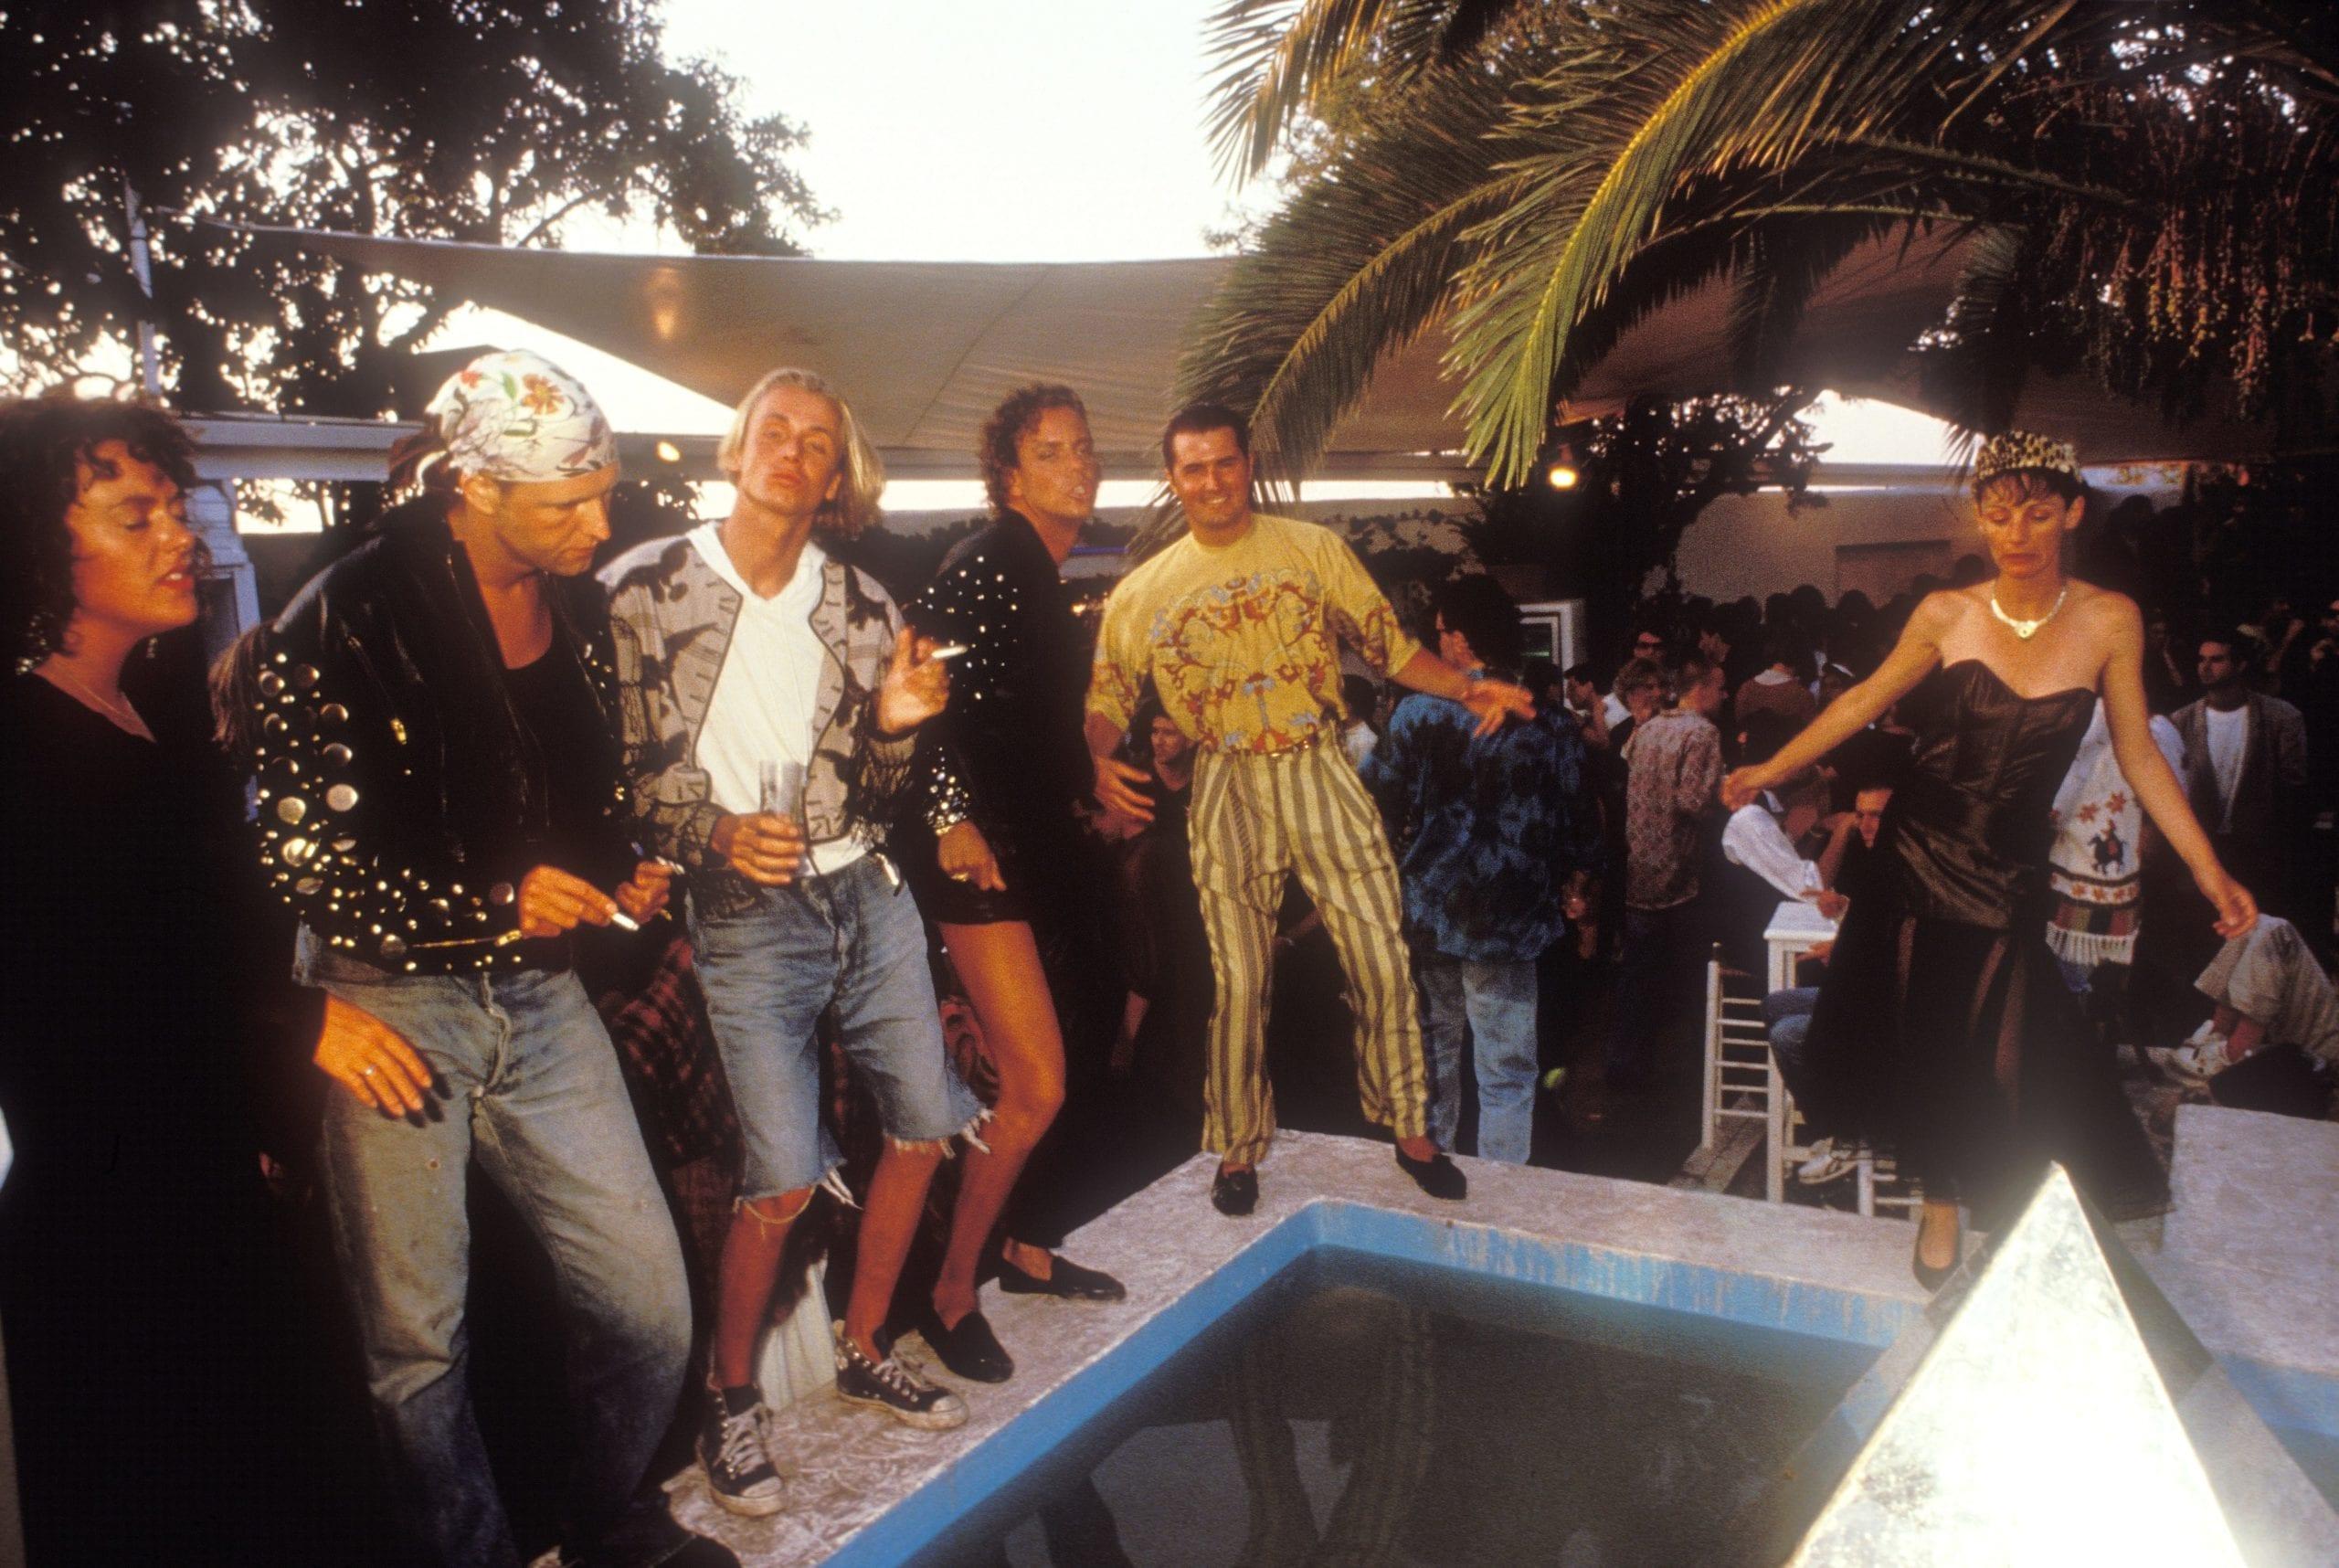 Clubbers dancing outdoors, Amnesia II courtyard, Ibiza 1989 © Dave Swindells/PYMCA